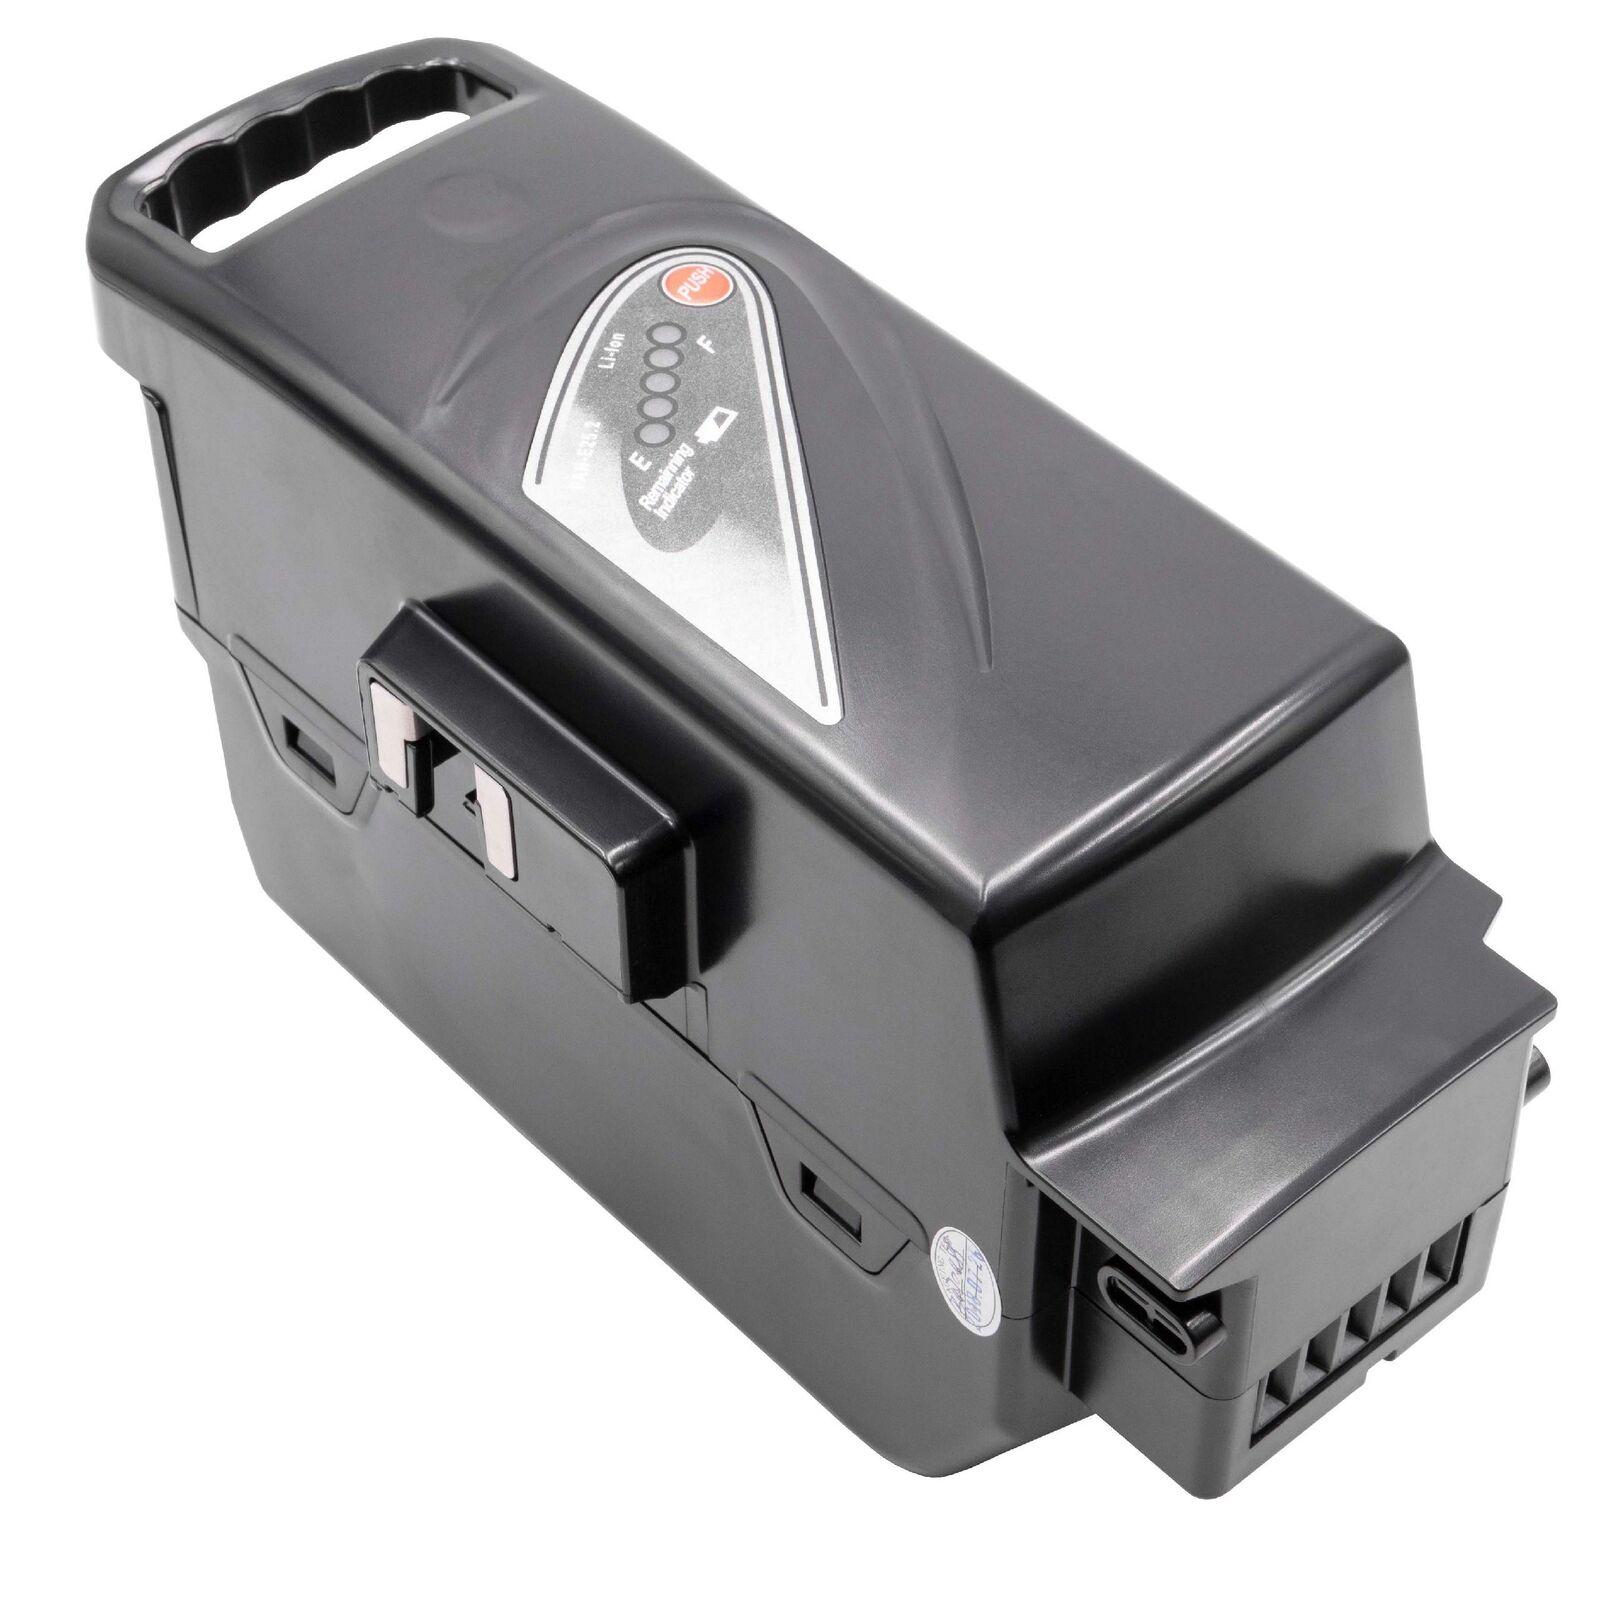 E-bike batería 23200mah negro intensilo ® para Panasonic nky335b2, nky226b02